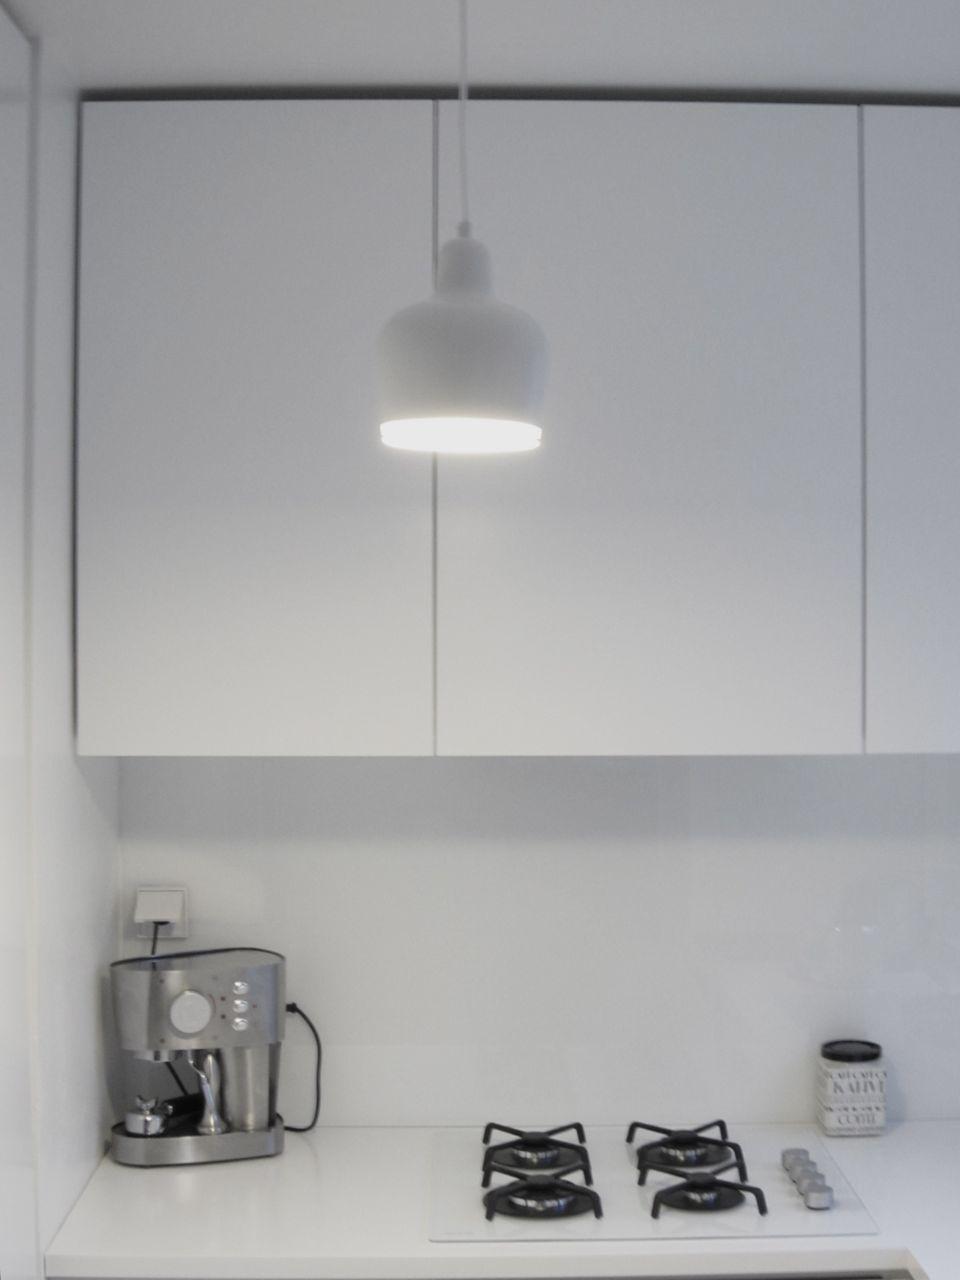 Minna Jones Giveaway winners + renovated kitchen